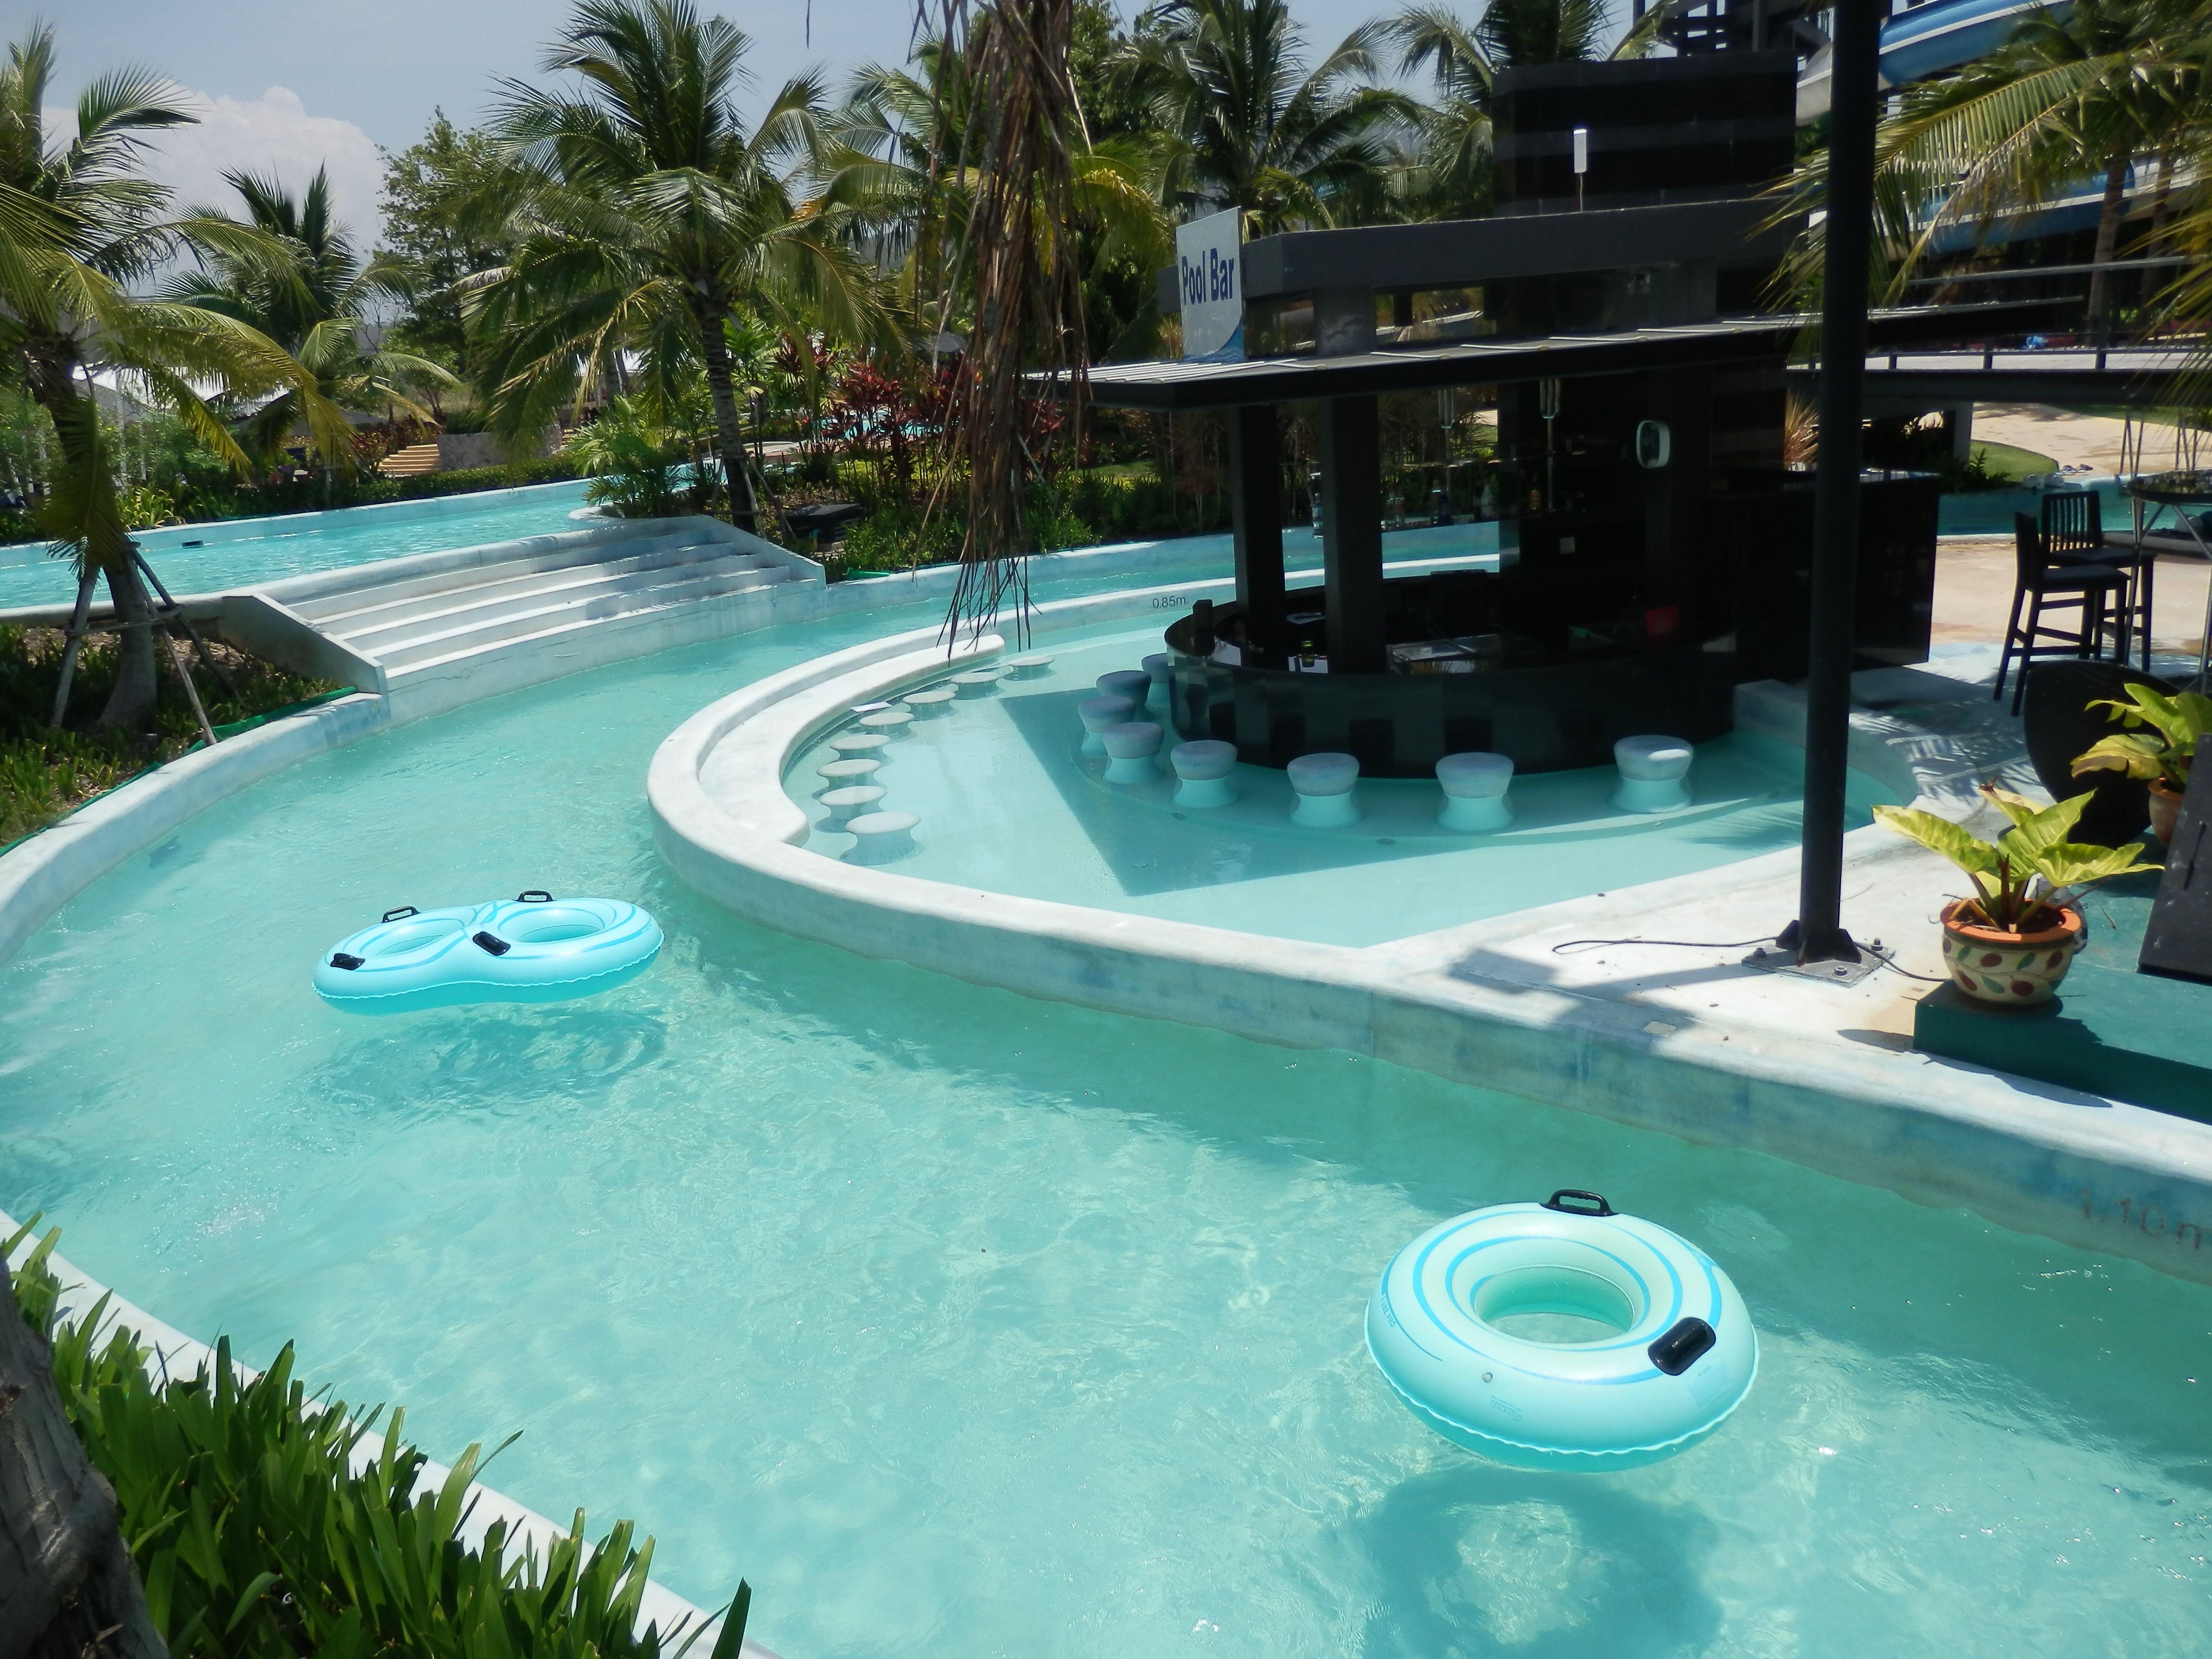 Lazy River Pool Bar At Black Mountain Water Park In Hua Hin